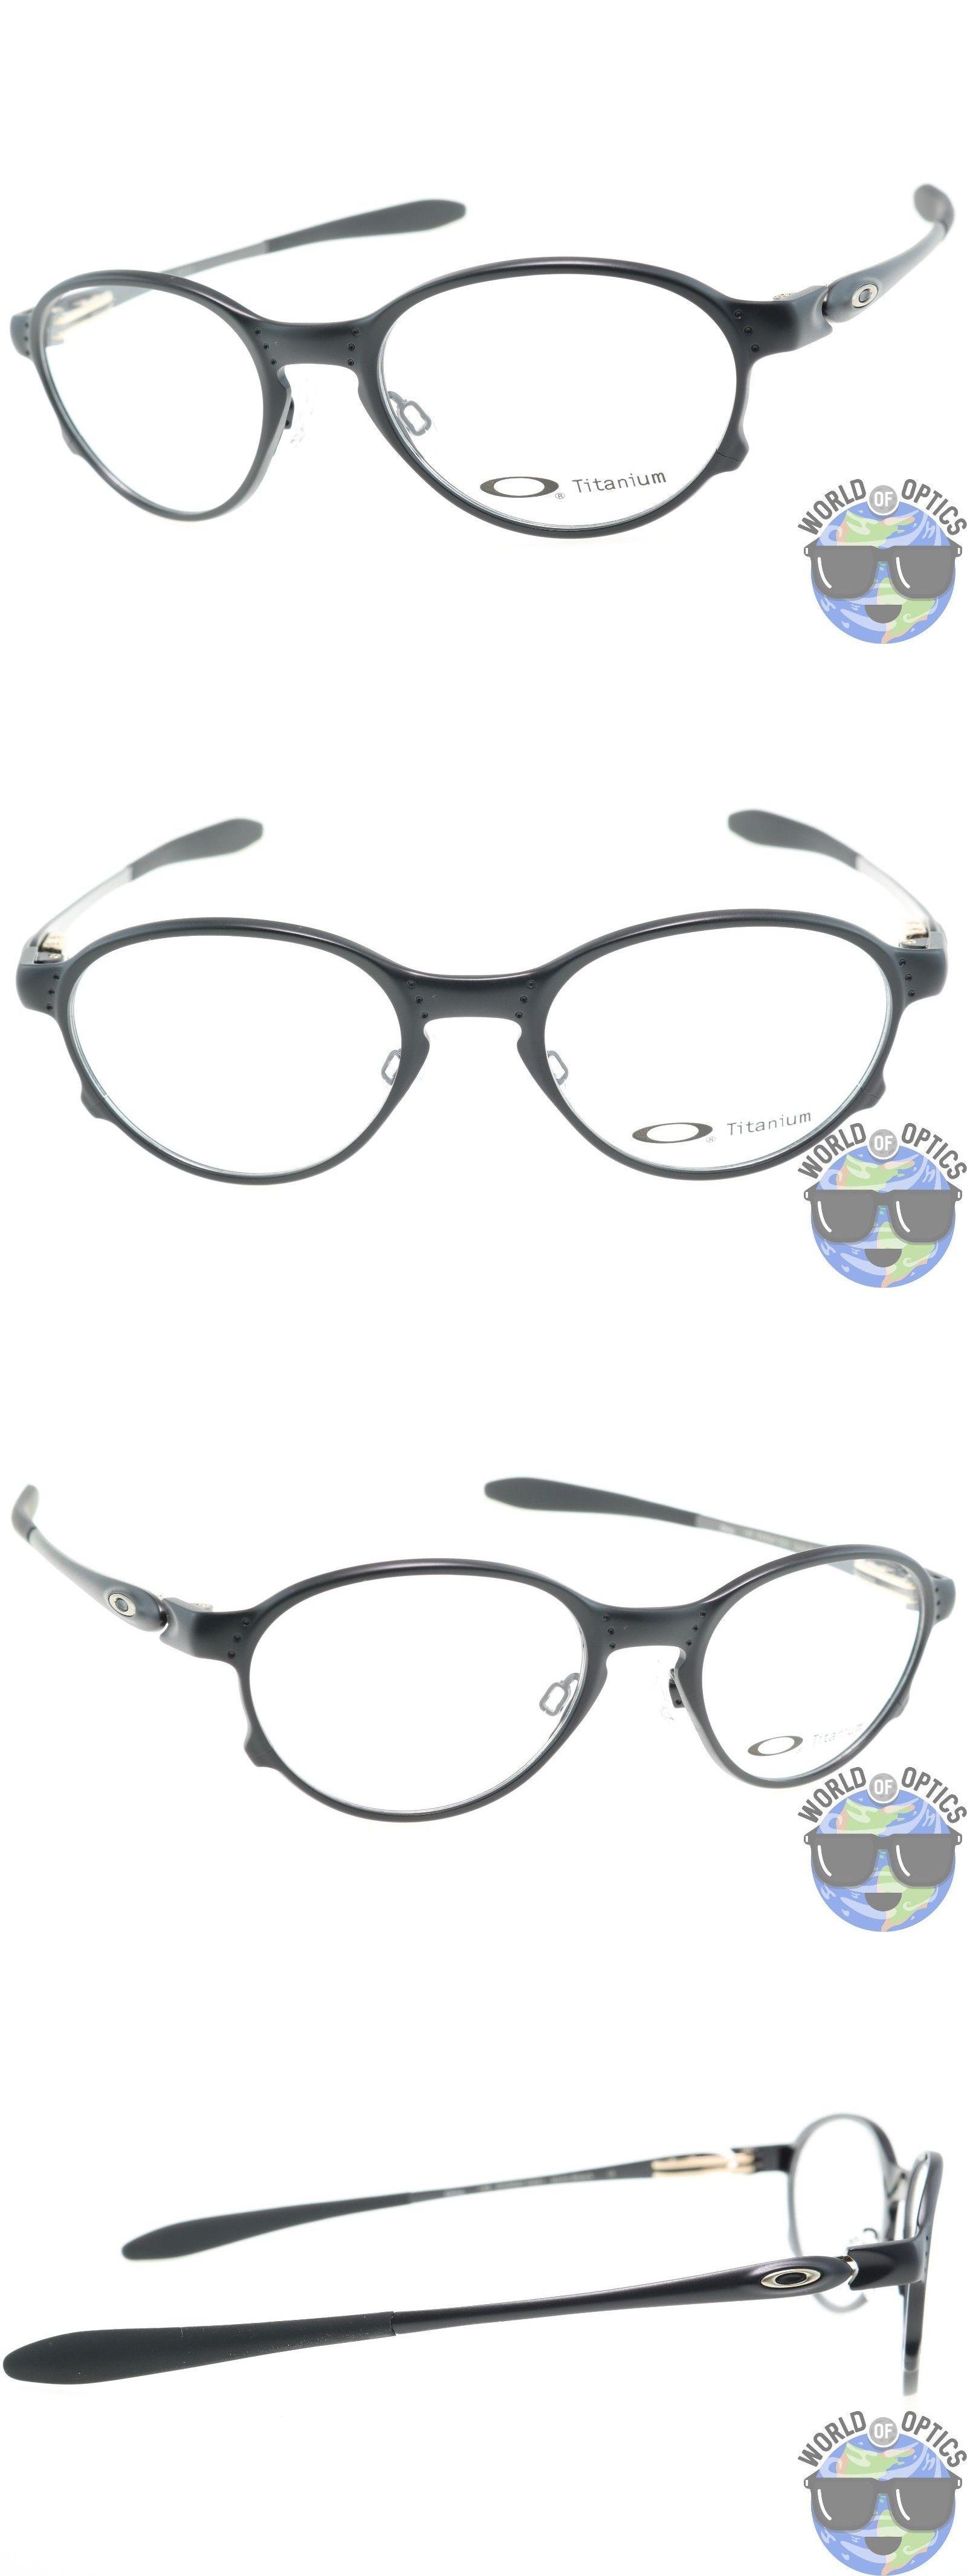 6cf8e0999ef Eyeglass Frames 180957  Oakley Rx Eyeglasses Ox5067-0251 Overlord Satin  Black Titanium Frame